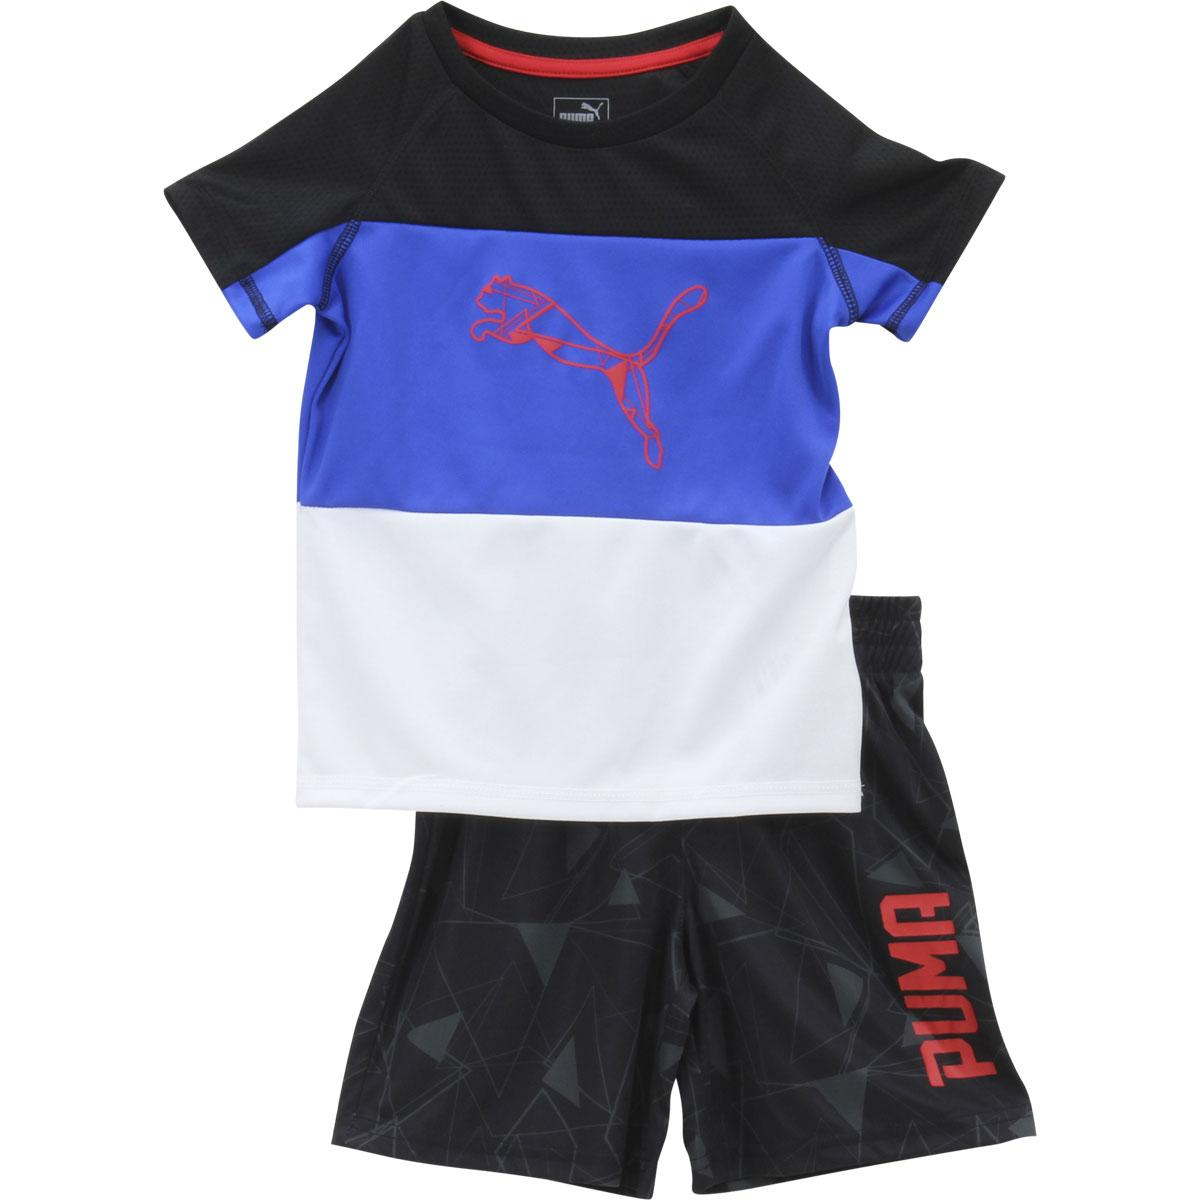 Puma Toddler Boy's 2-Piece Abstract Cat Short Sleeve T-Shirt & Shorts Set